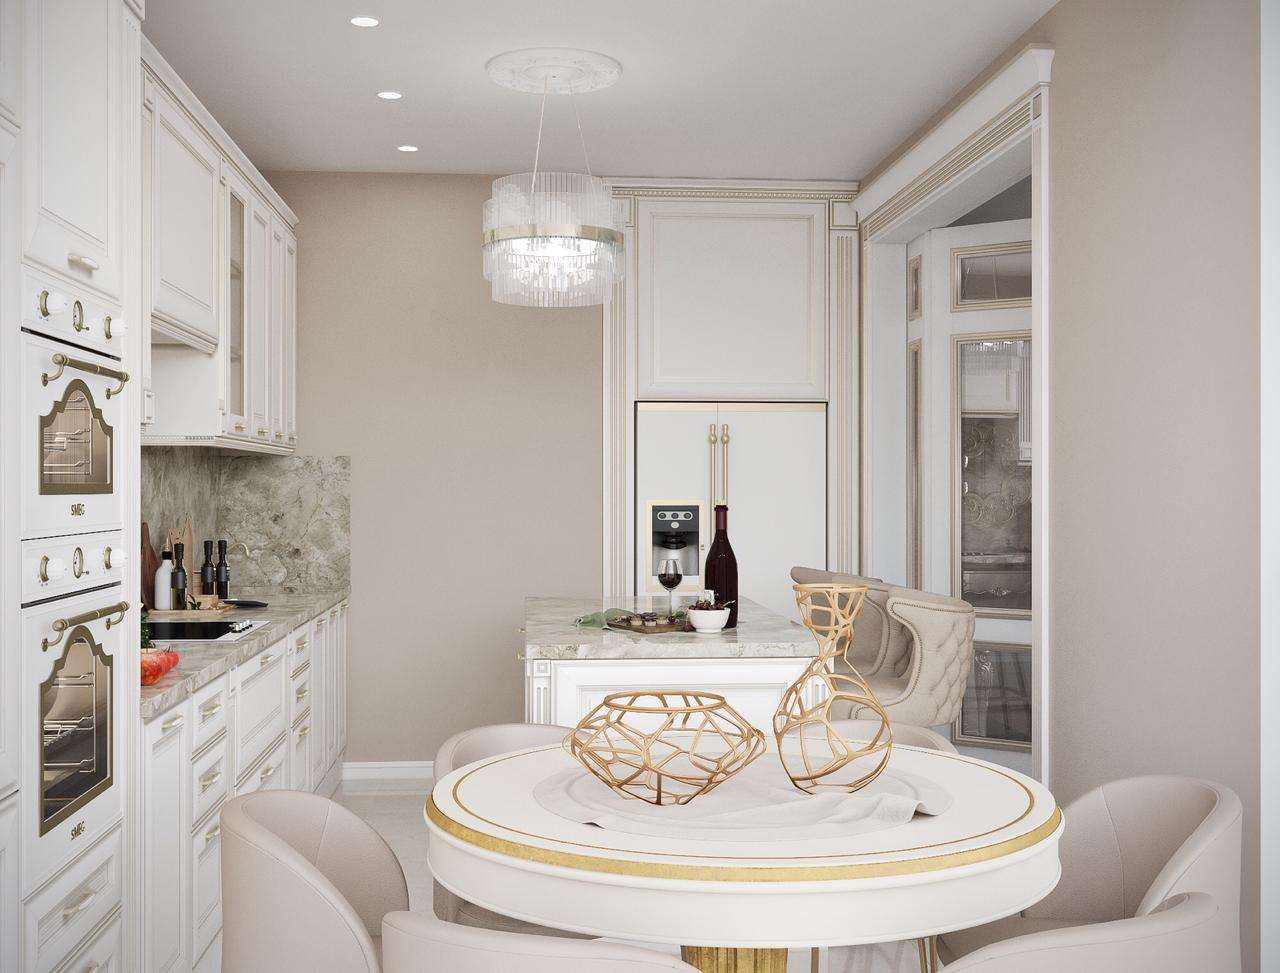 кухня на заказ с фрезерованными фасадам МДФ